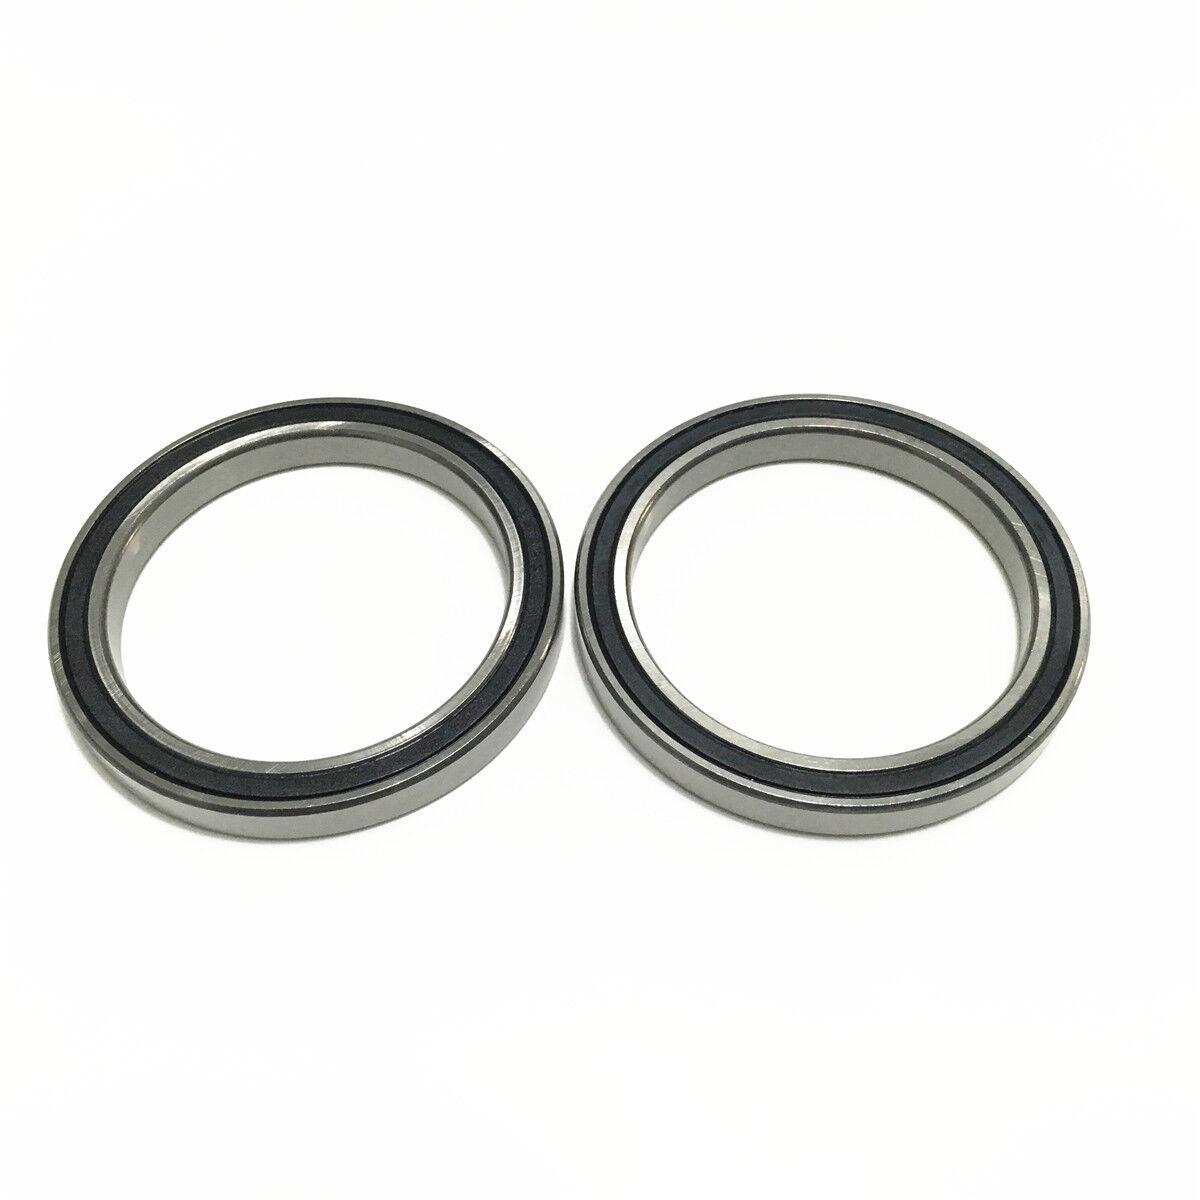 5 Pcs Premium 6202 2RS ABEC3 Rubber Sealed Deep Groove Ball Bearing 15x35x11mm